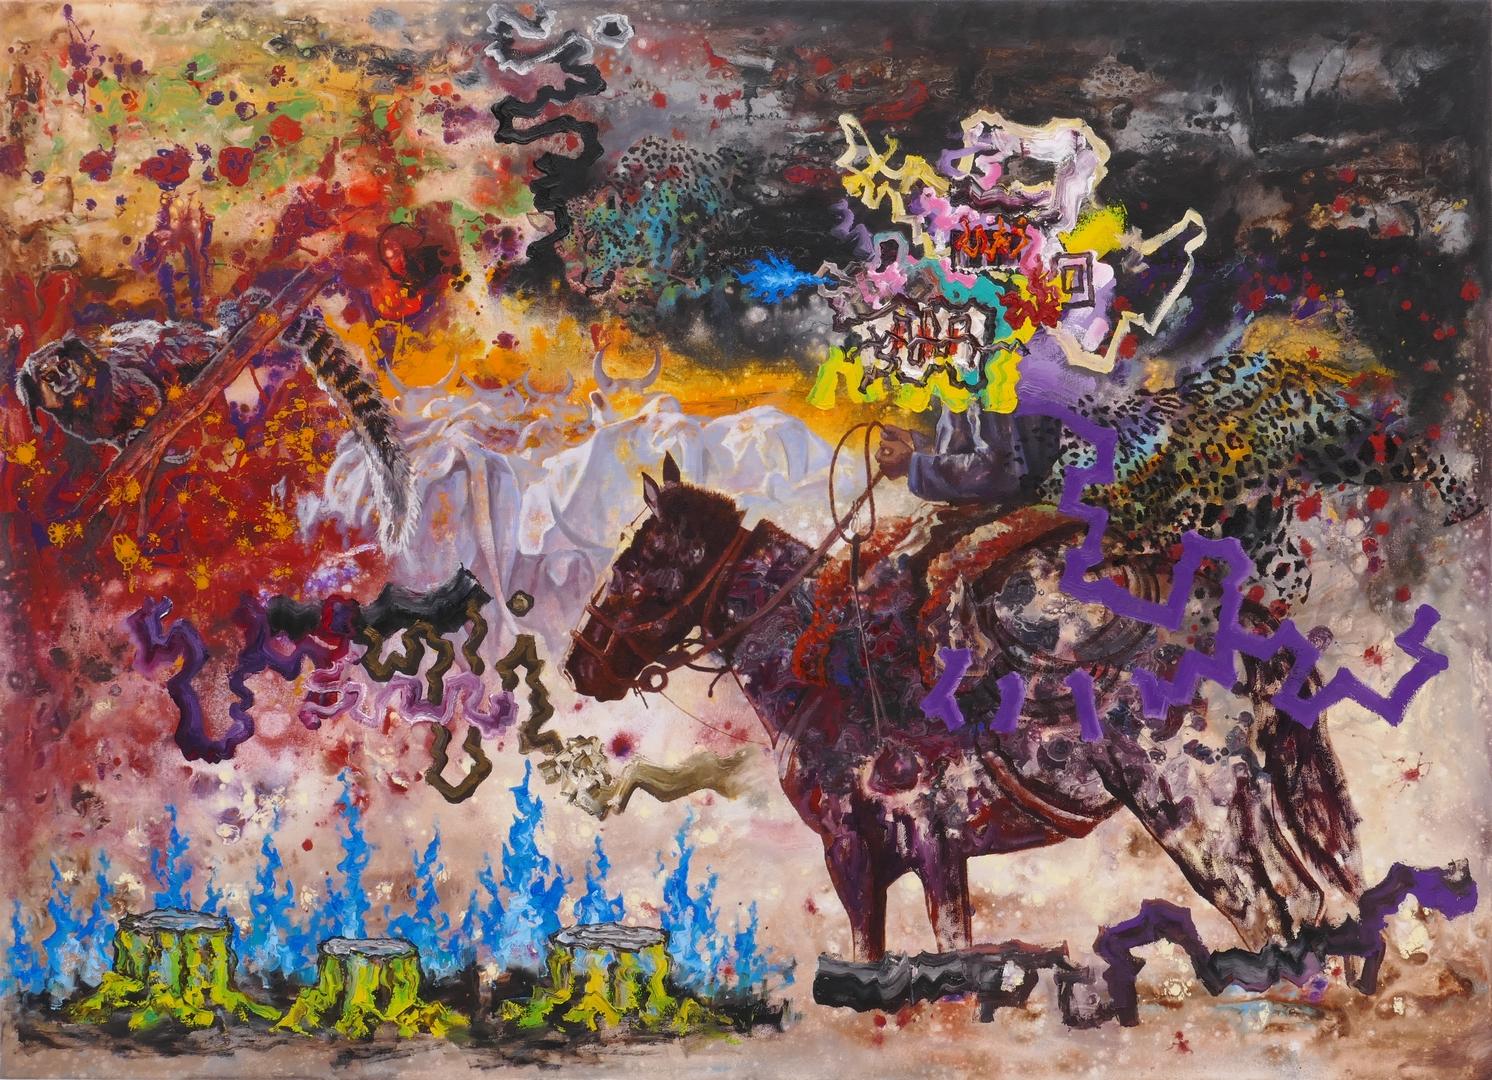 B, Cowboy in Brasilien II, 130x180cm, Öl, Acryl auf Leinwand,2021